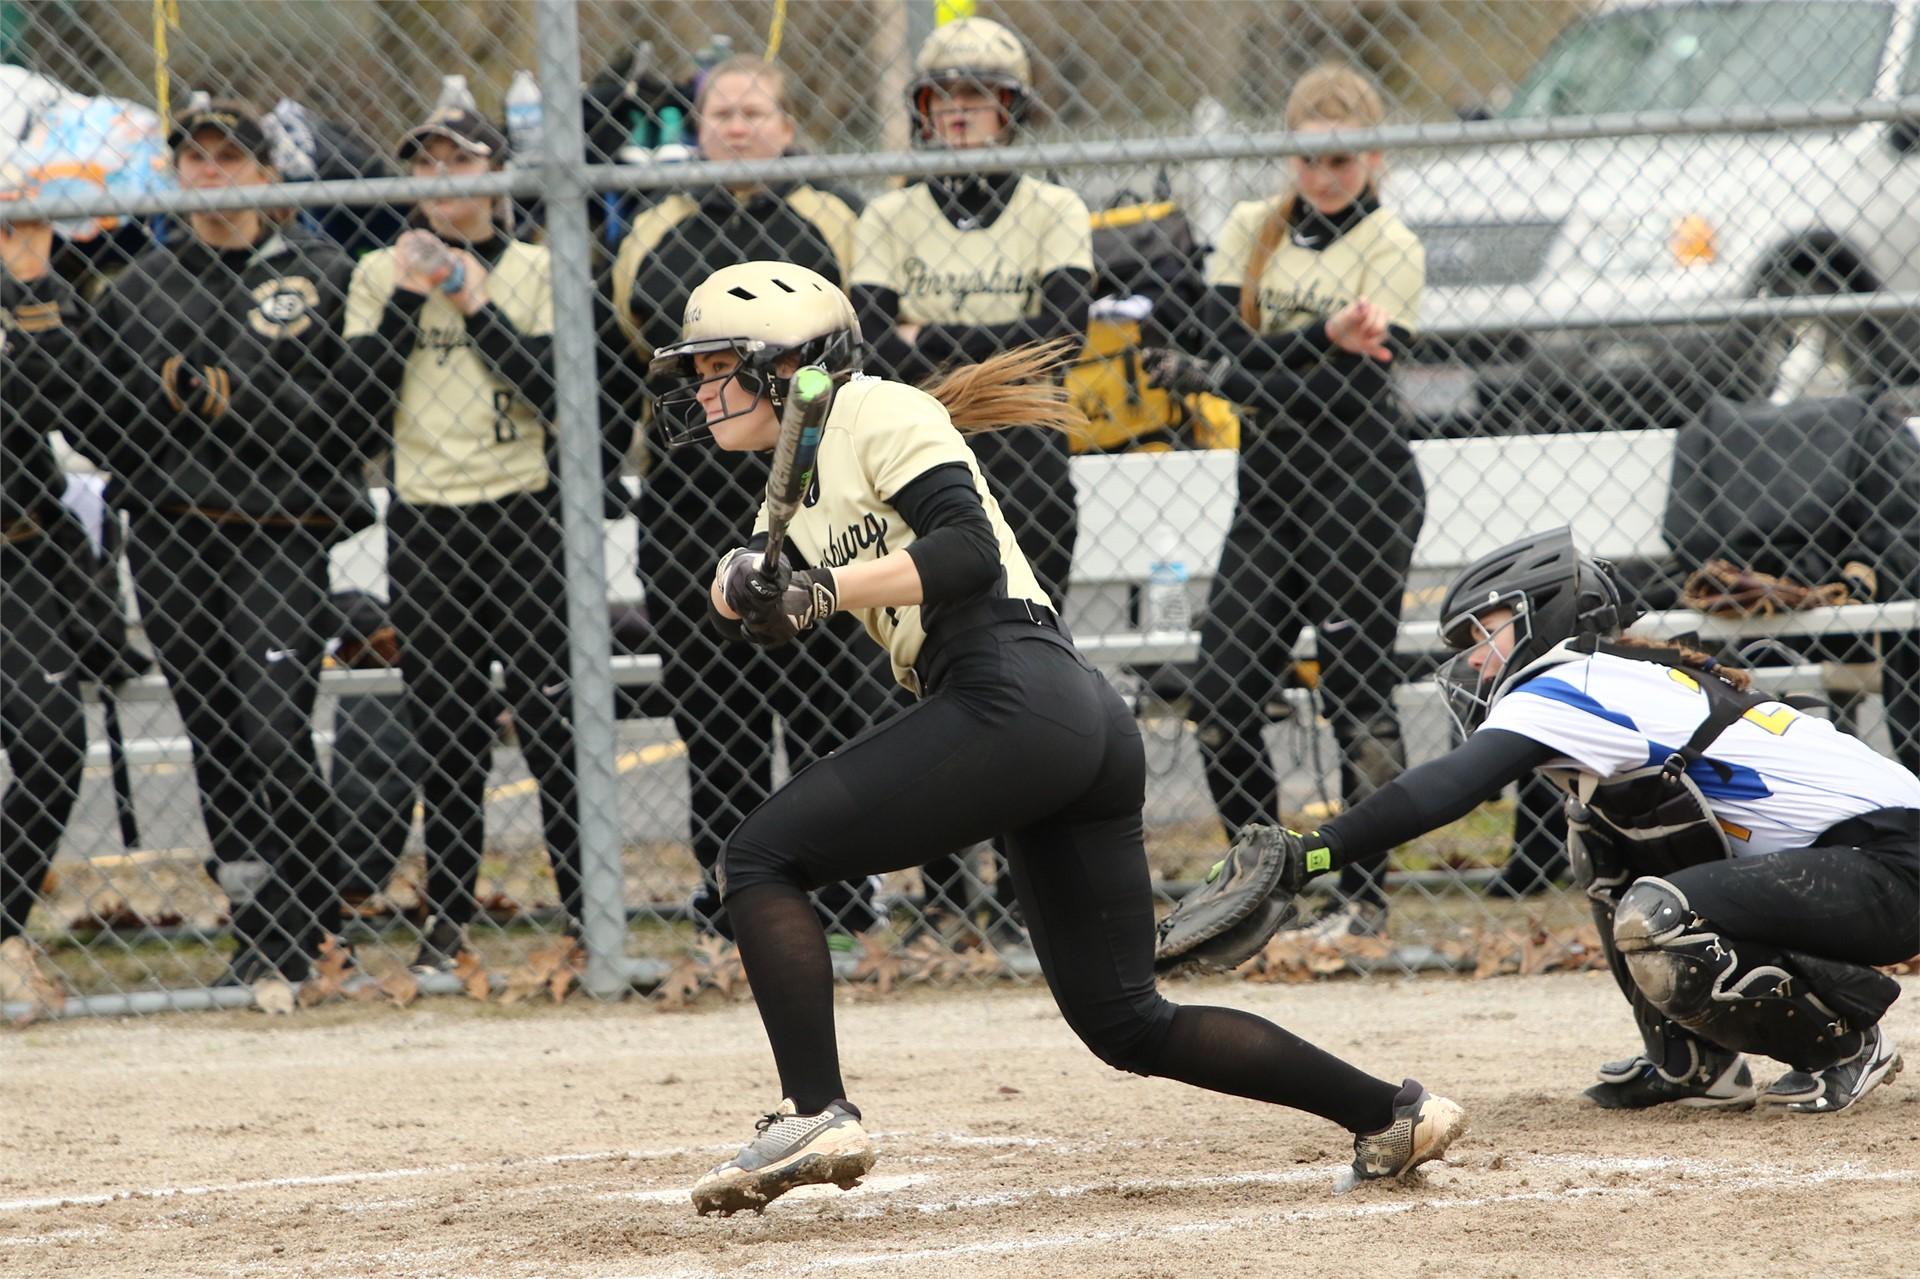 softball player hitting